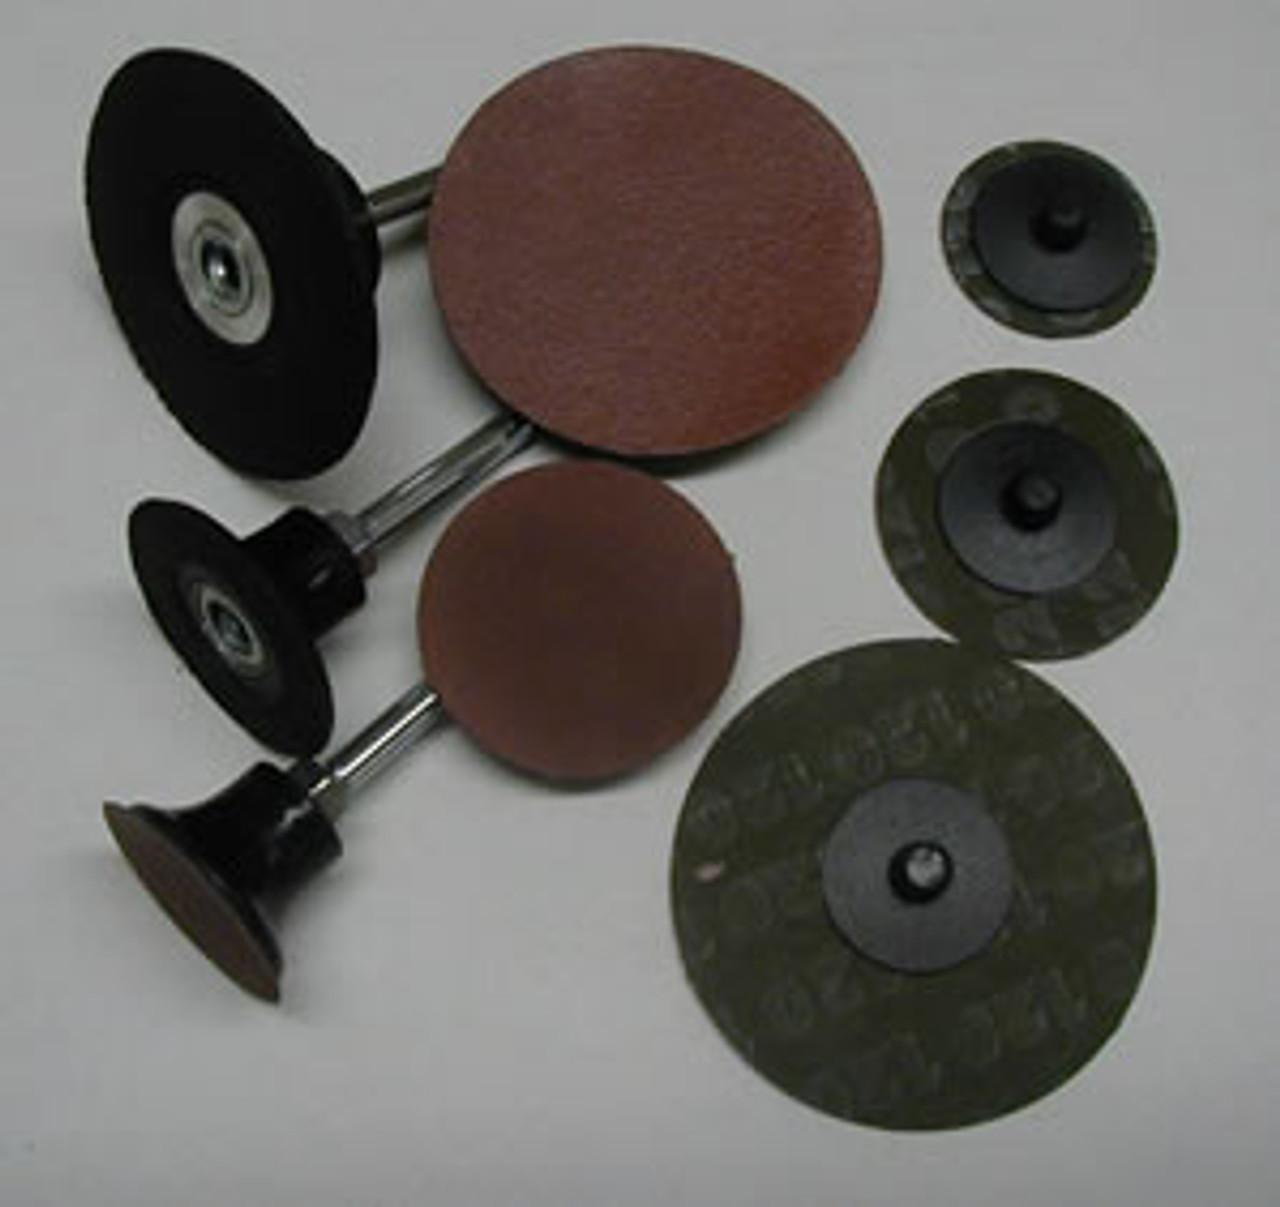 "Aluminum Oxide Sanding Disk 1.5"" - 100 Grit"